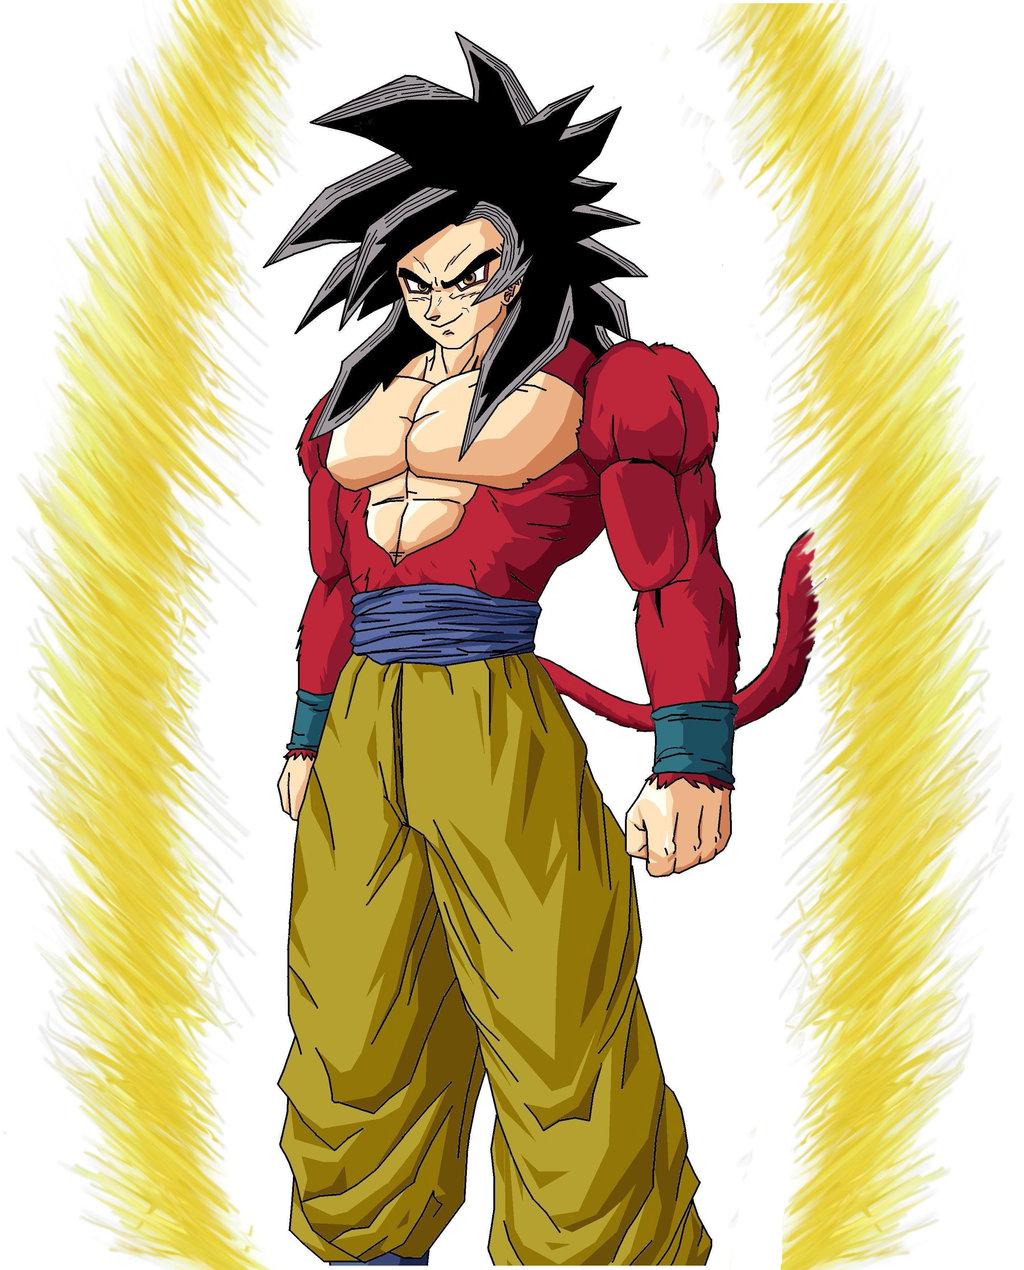 Super Saiyan 4 Goku Wallpaper Sf Wallpaper